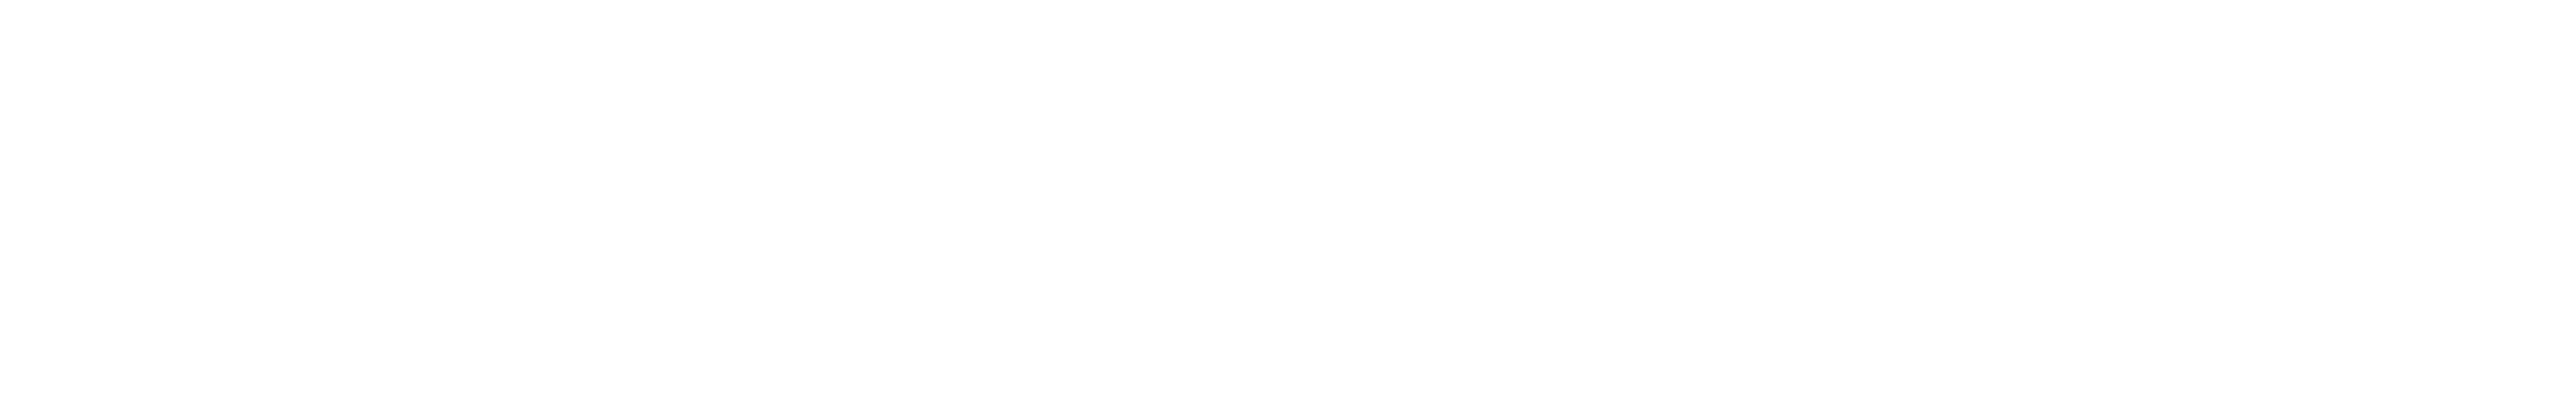 Raleigh Gyros Timeline